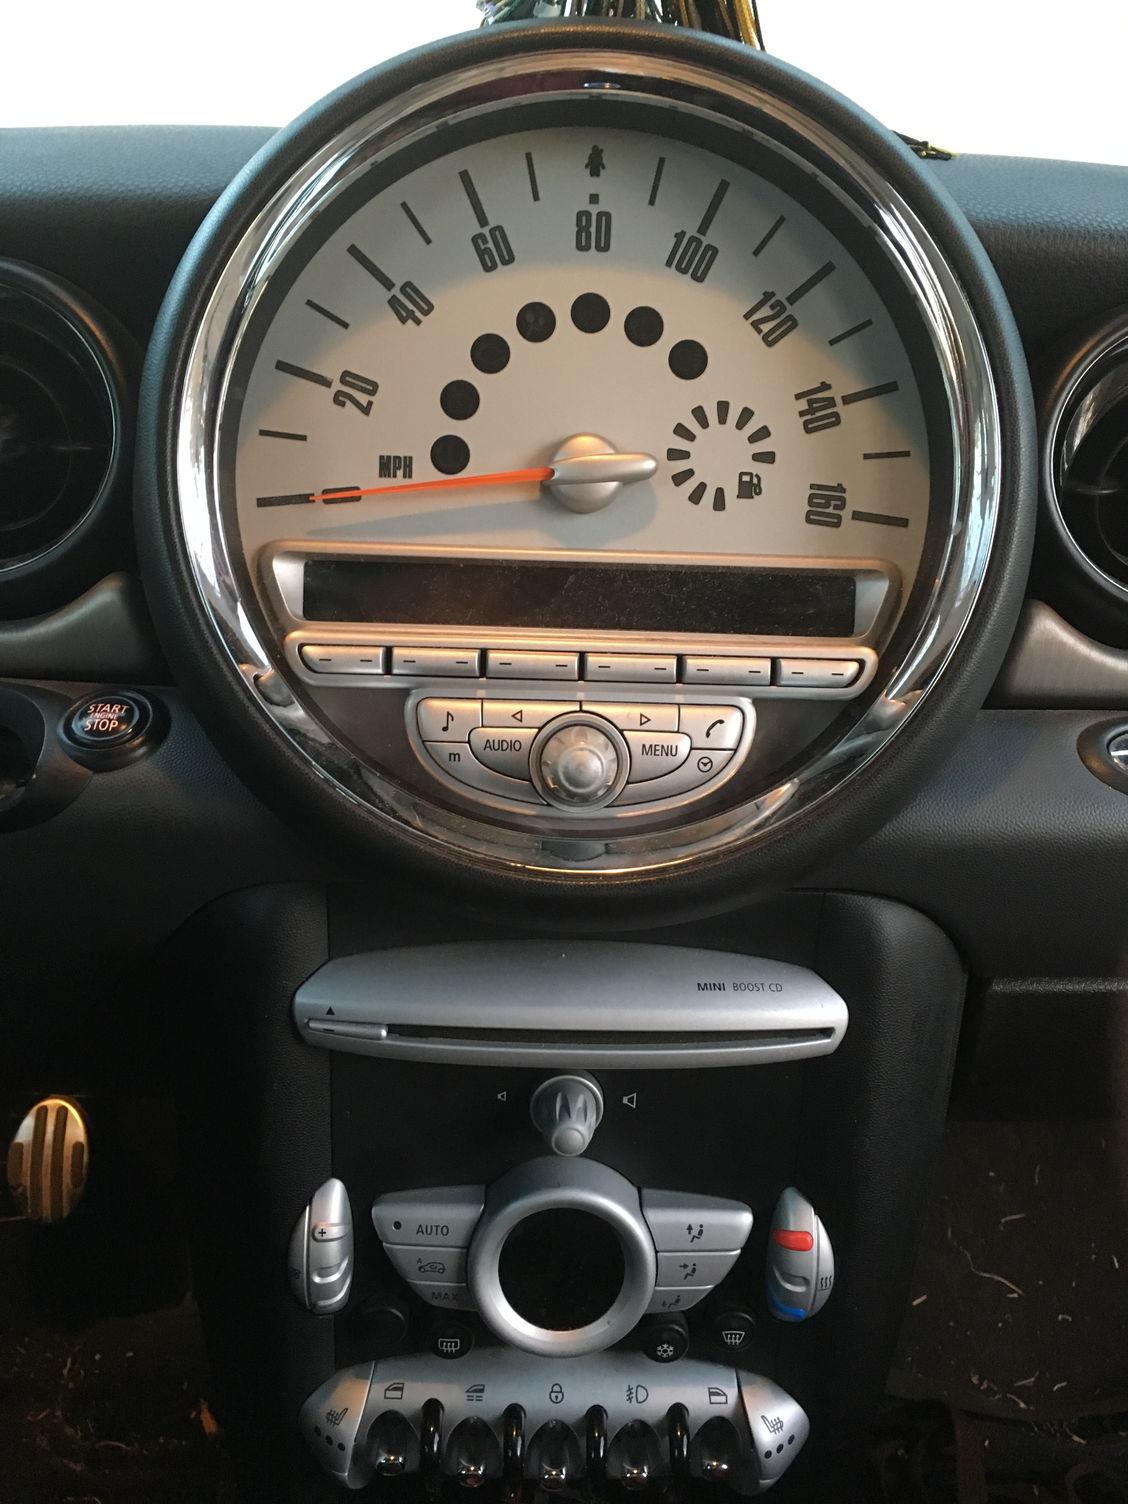 2009 mini cooper s convertible r57 aftermarket nav audio. Black Bedroom Furniture Sets. Home Design Ideas